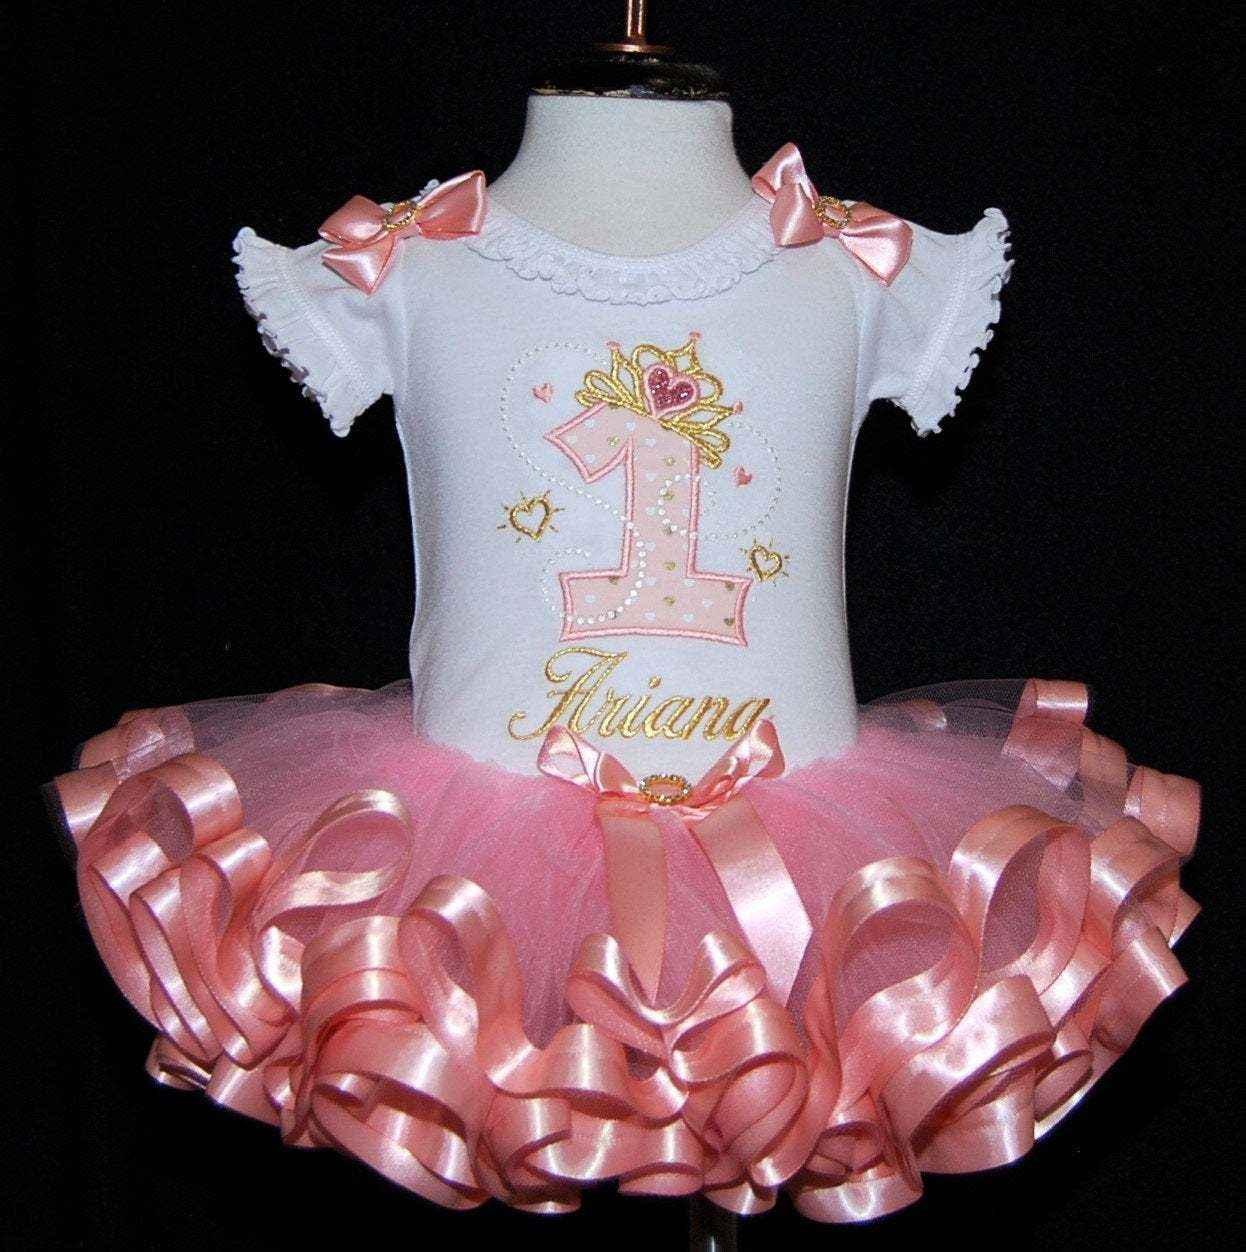 1st birthday girl outfit, gold tiara princess birthday dress